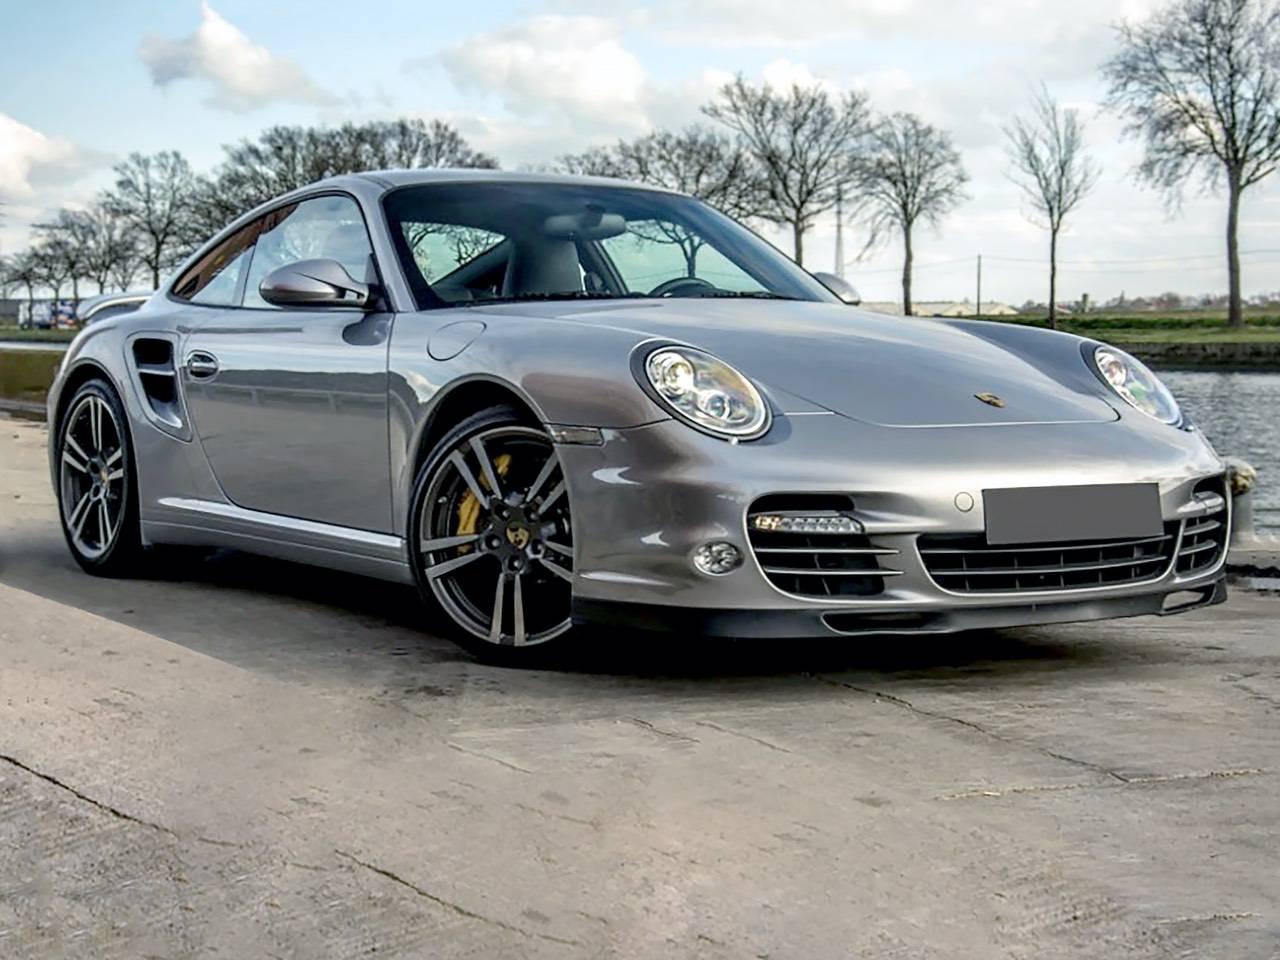 Porsche-911-Turbo-S-MKII-10